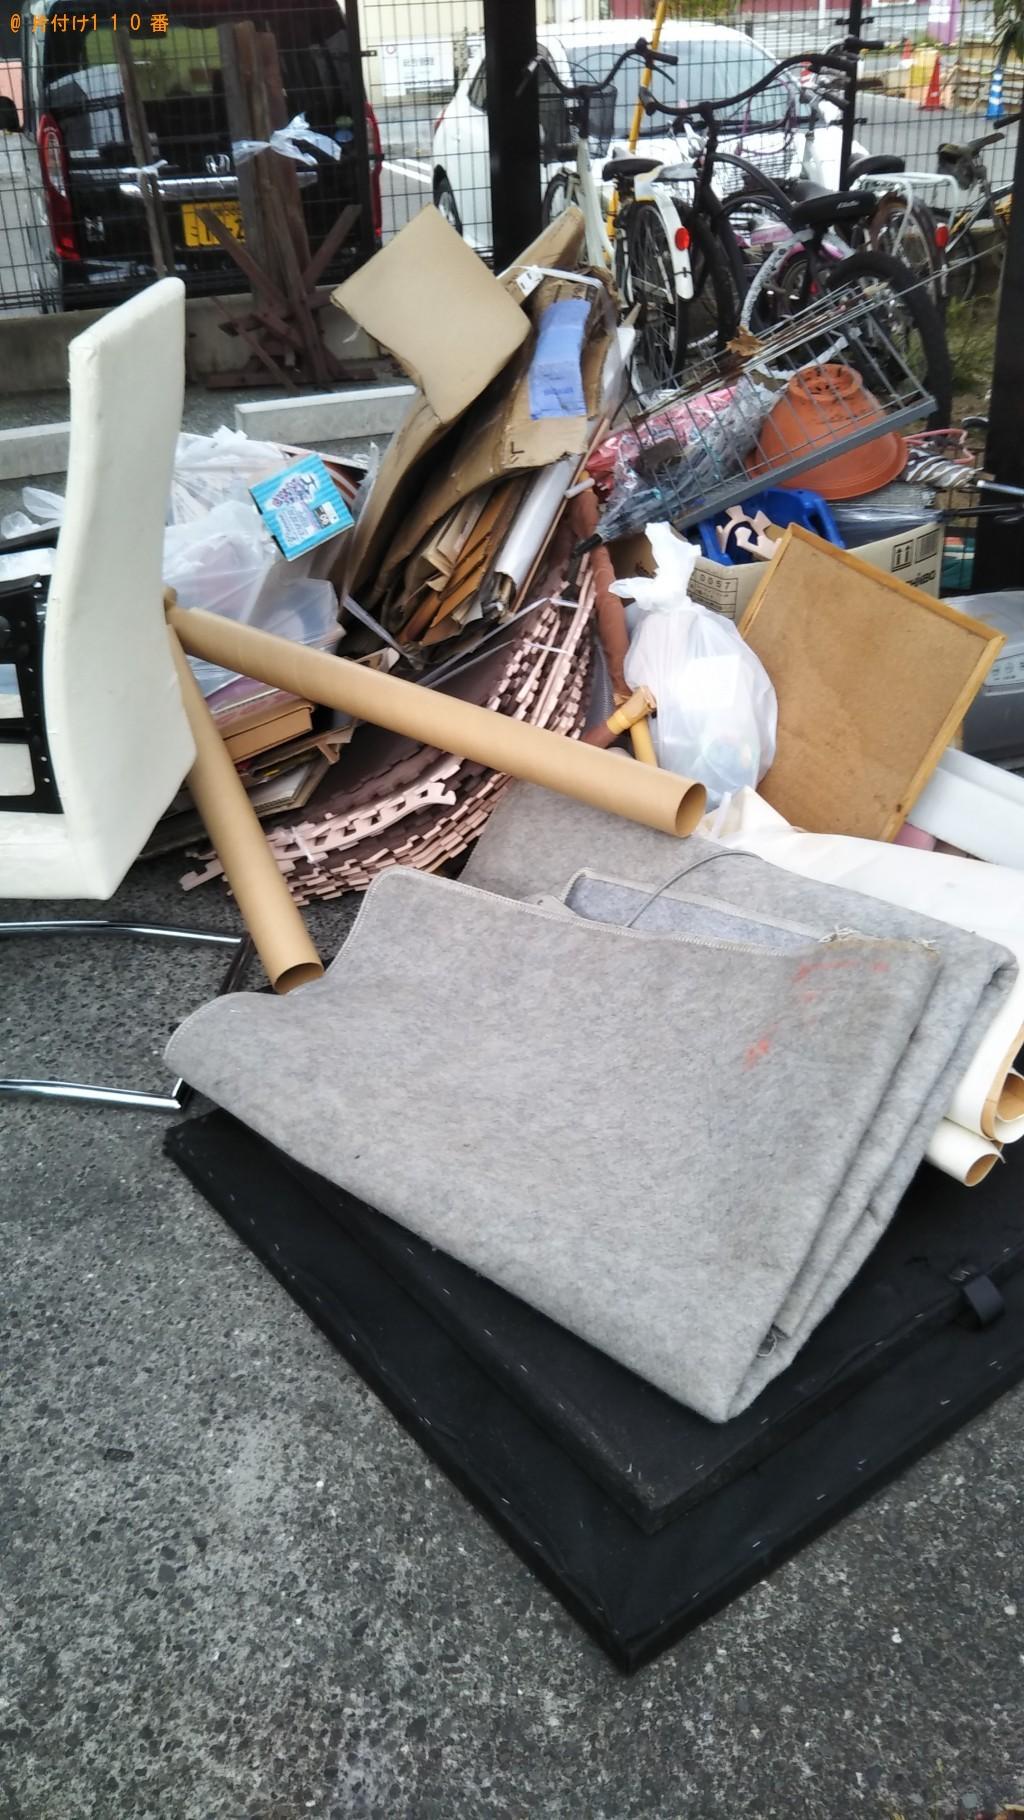 【松山市朝生田町】軽トラック1台程度の出張不用品の回収・処分ご依頼